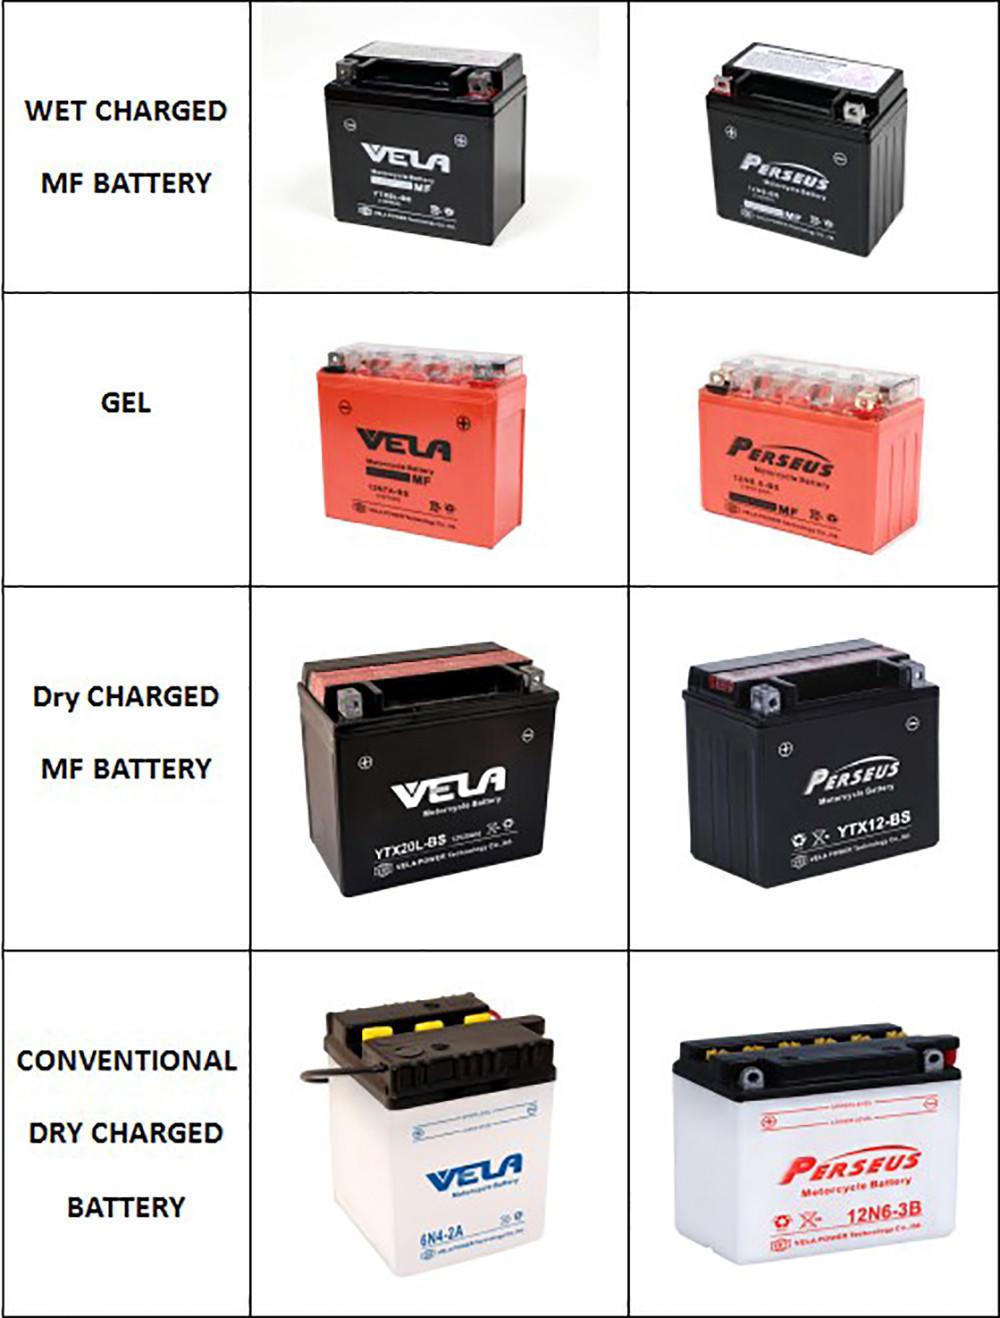 VELA gel motorcycle battery popular for motorcycle industry